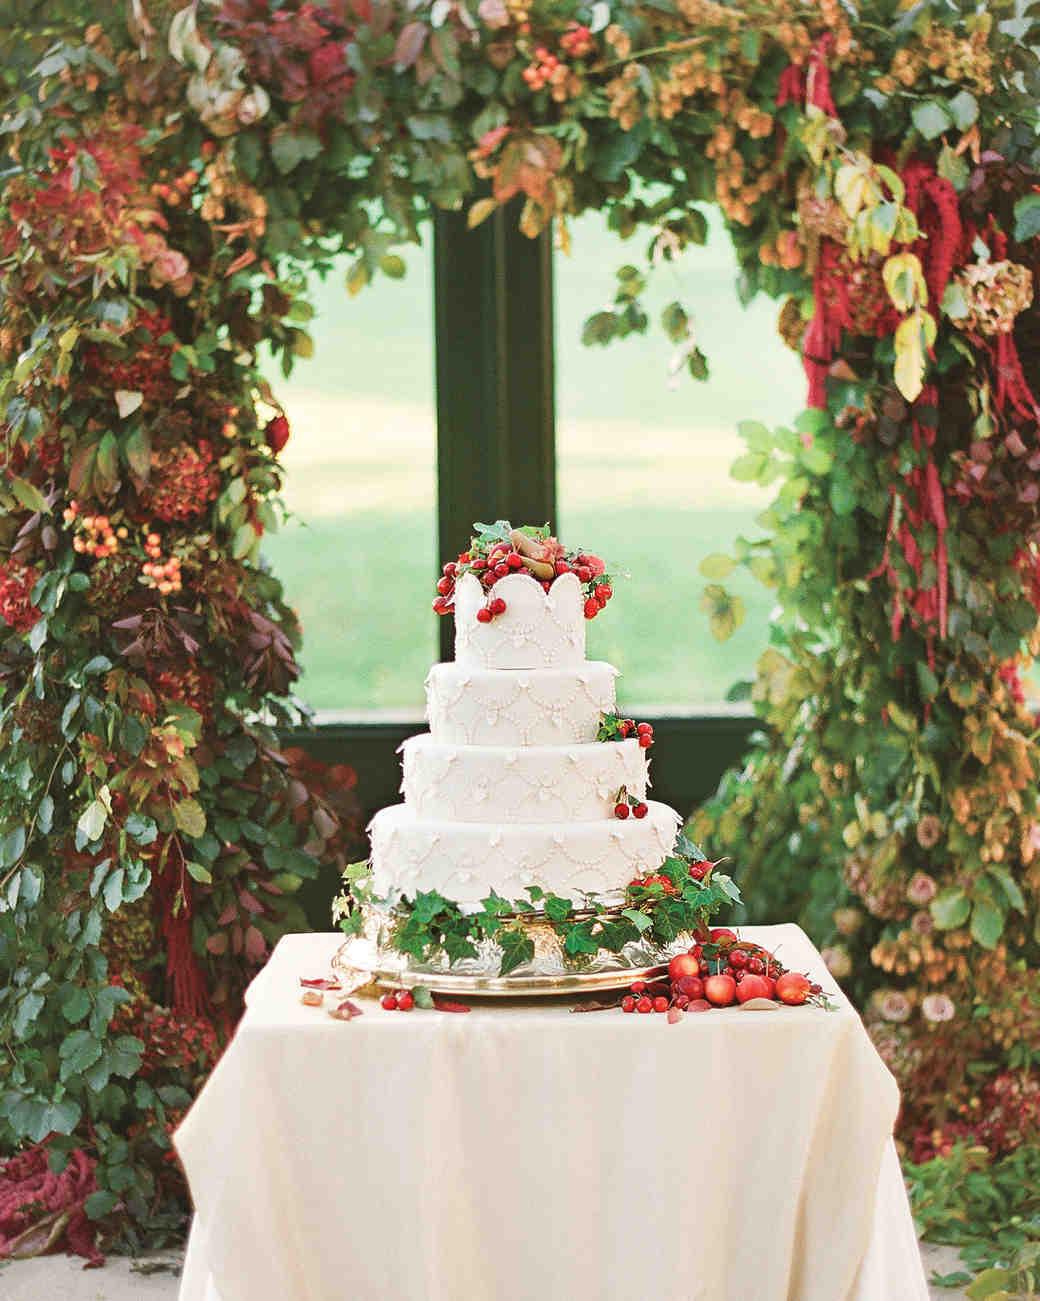 jo-andrew-wedding-ireland-2190-s112147.jpg